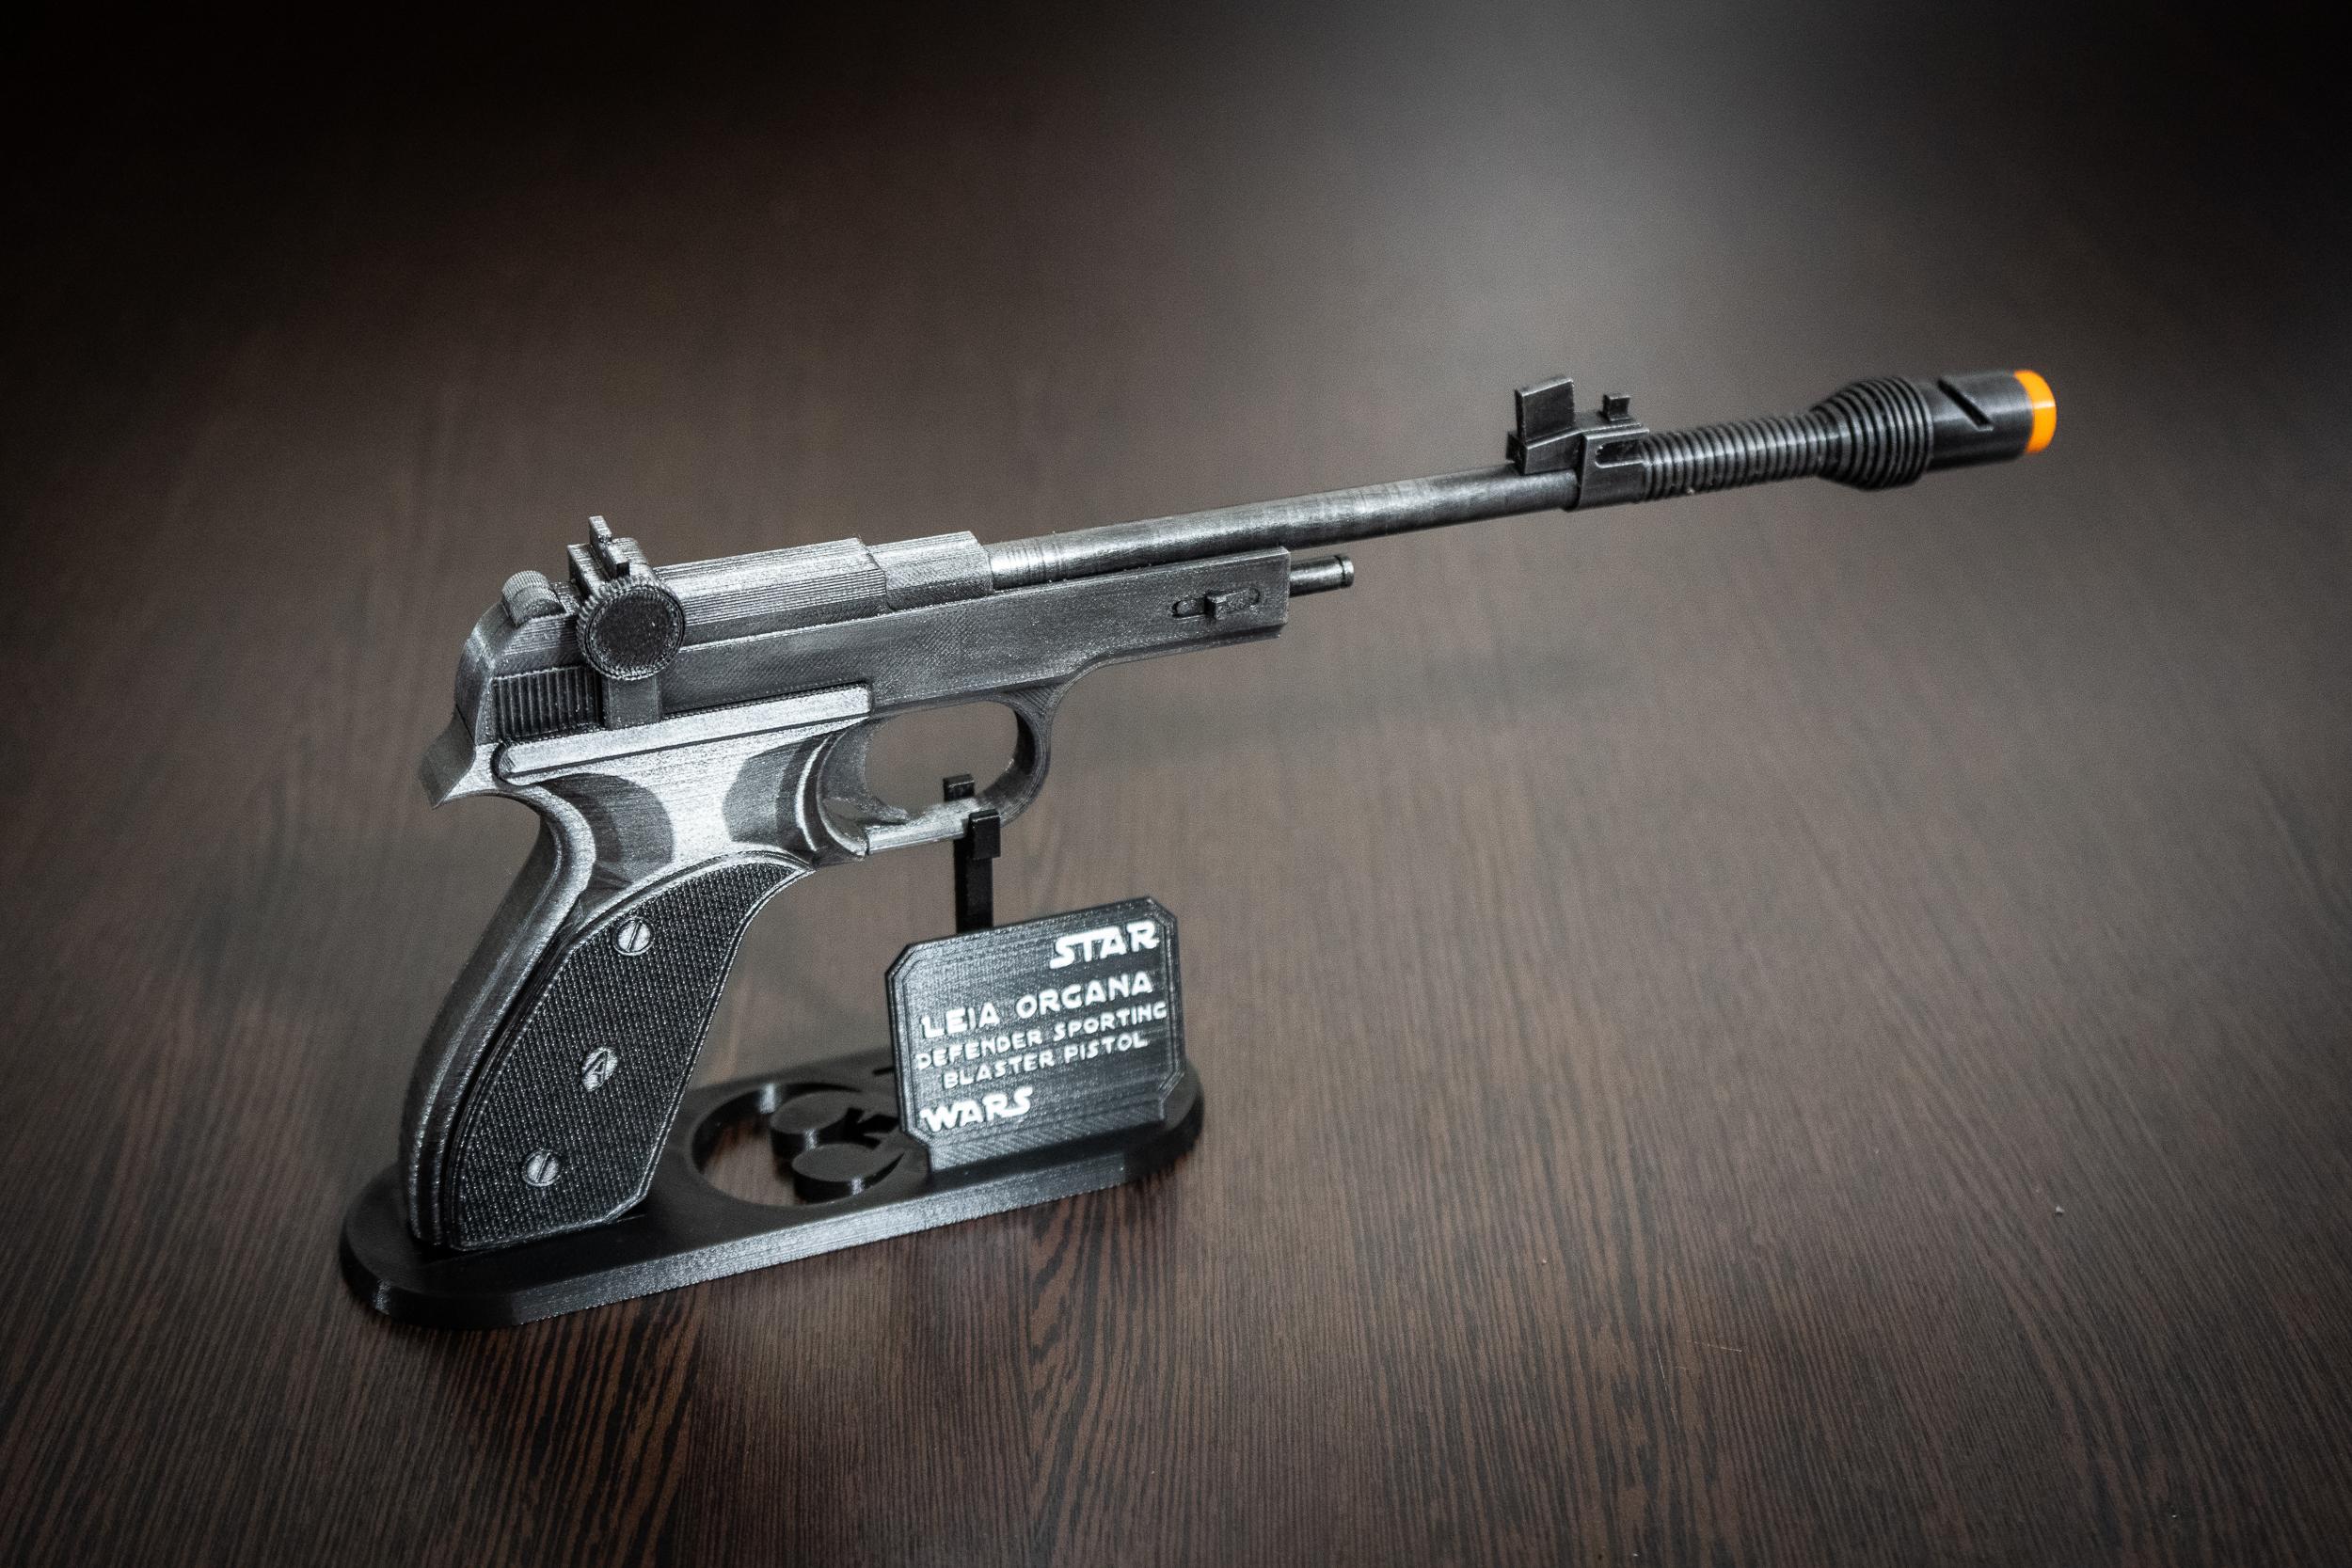 STL file for 3D Printing 3d Printable Star Wars Pistol Replica Prop for Cosplay Princess Leia Defender Sporting Blaster 3D Model